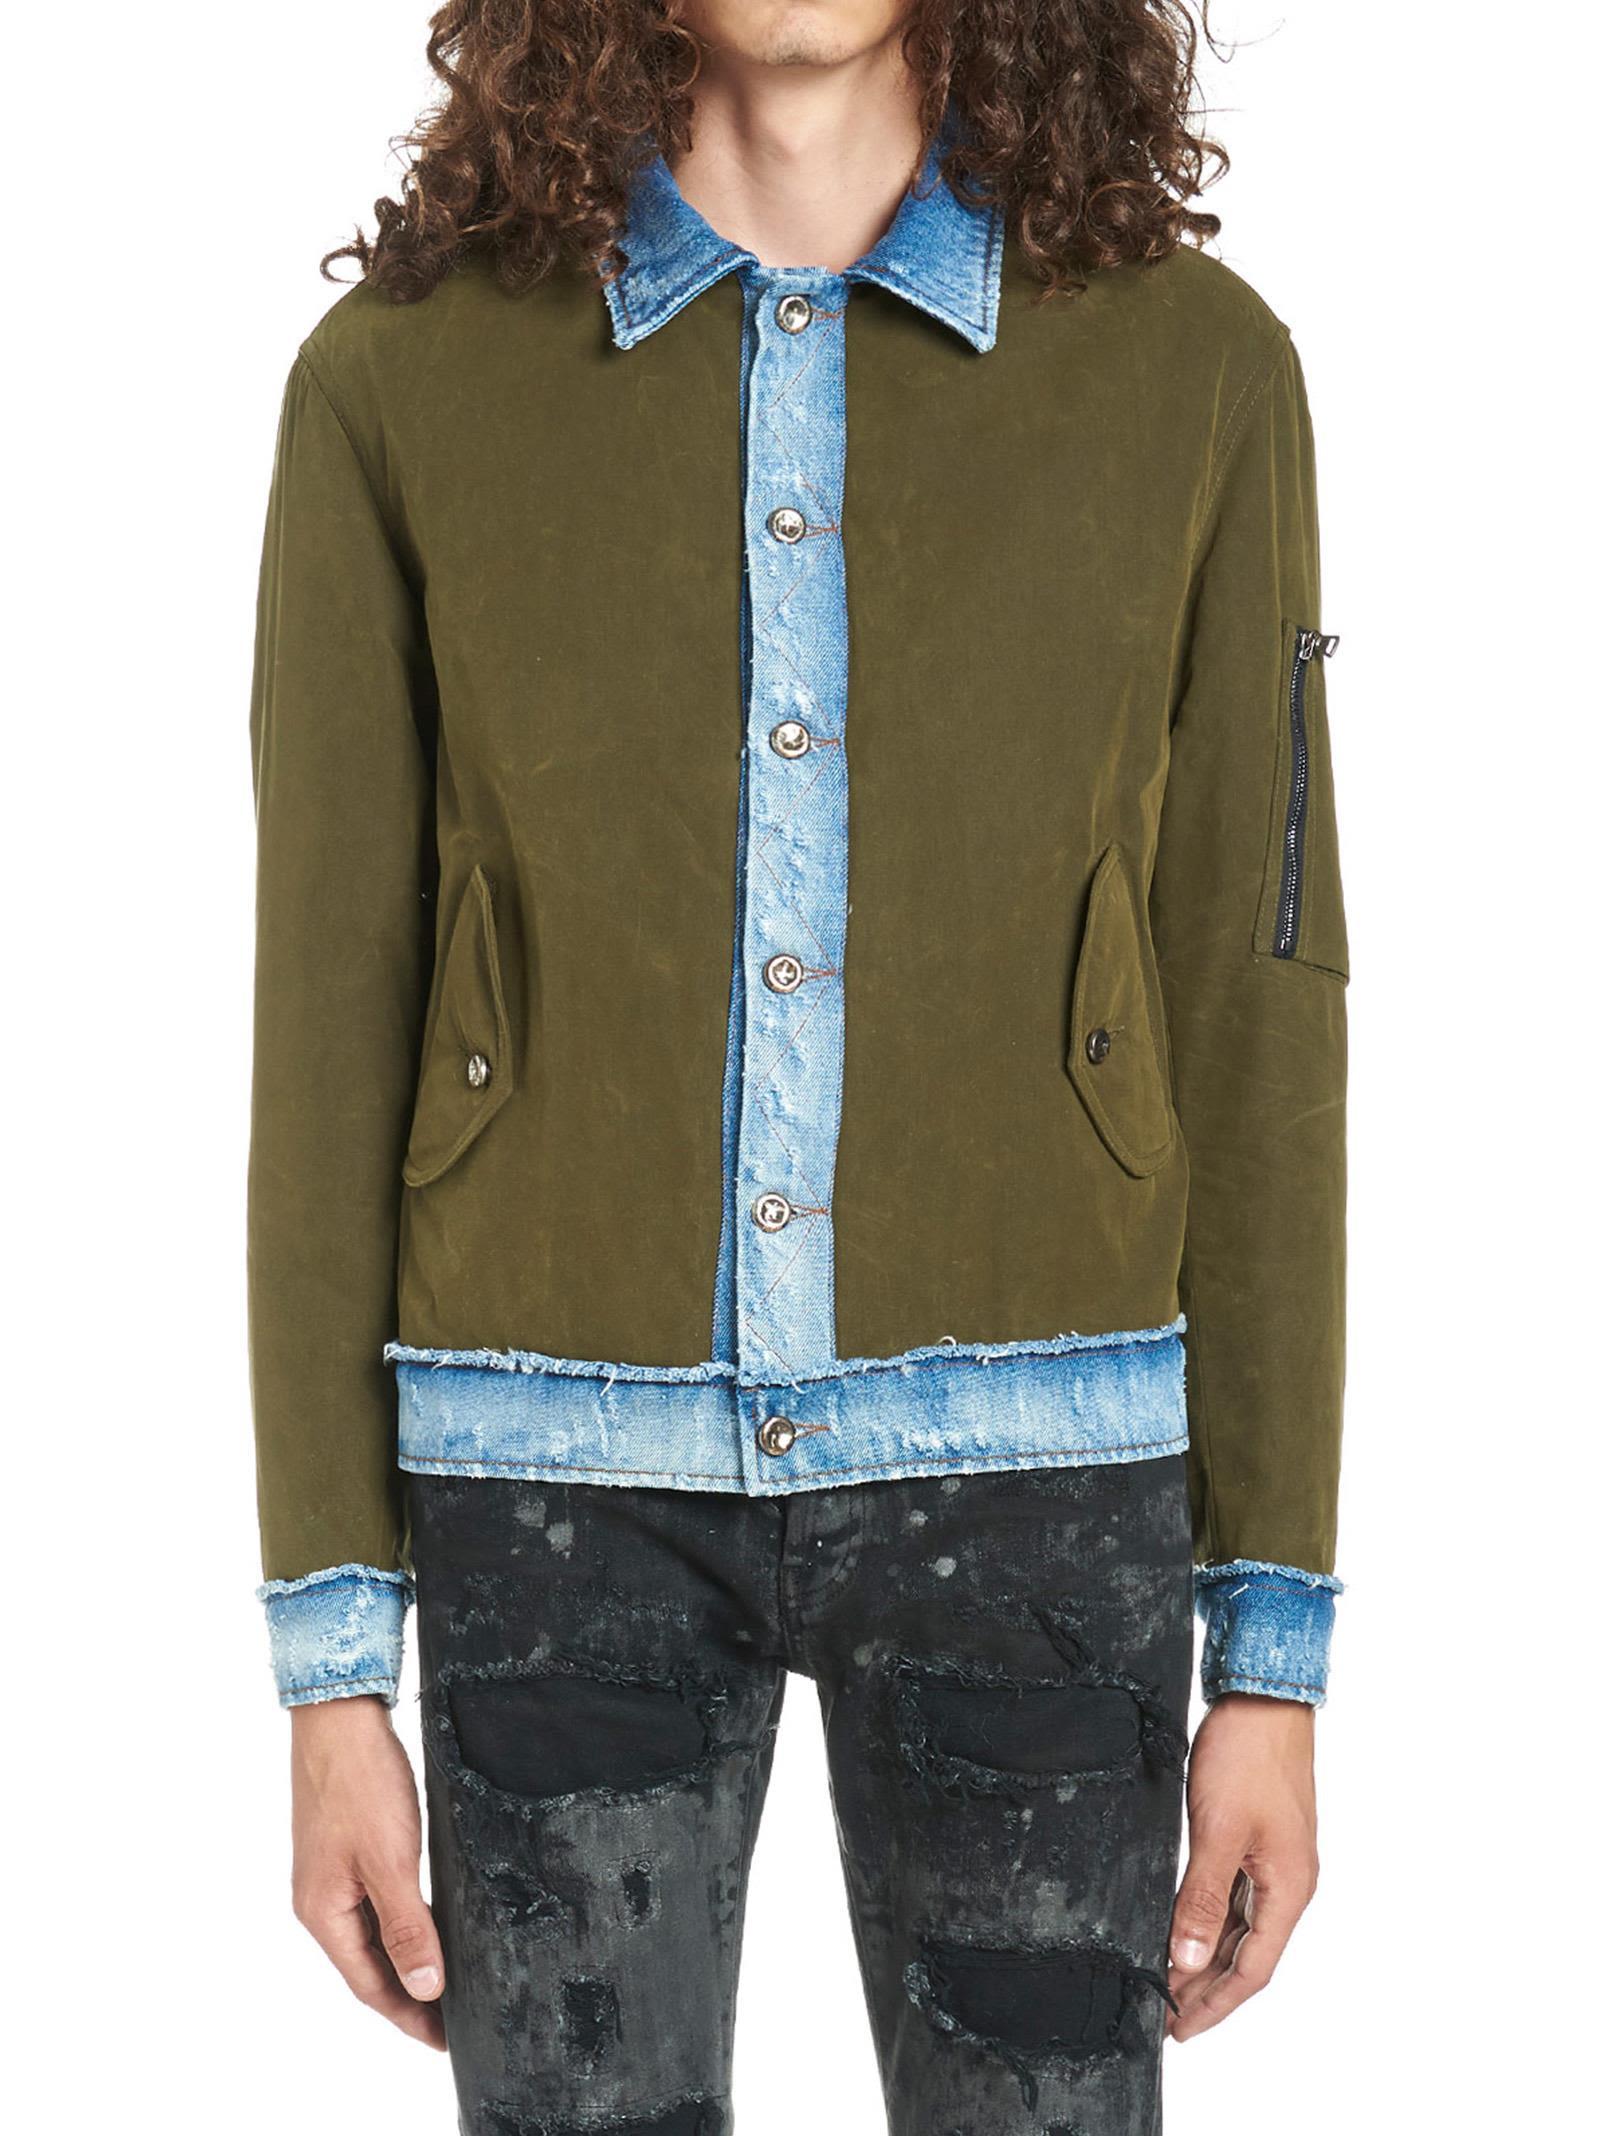 Overcome 'military' Jacket